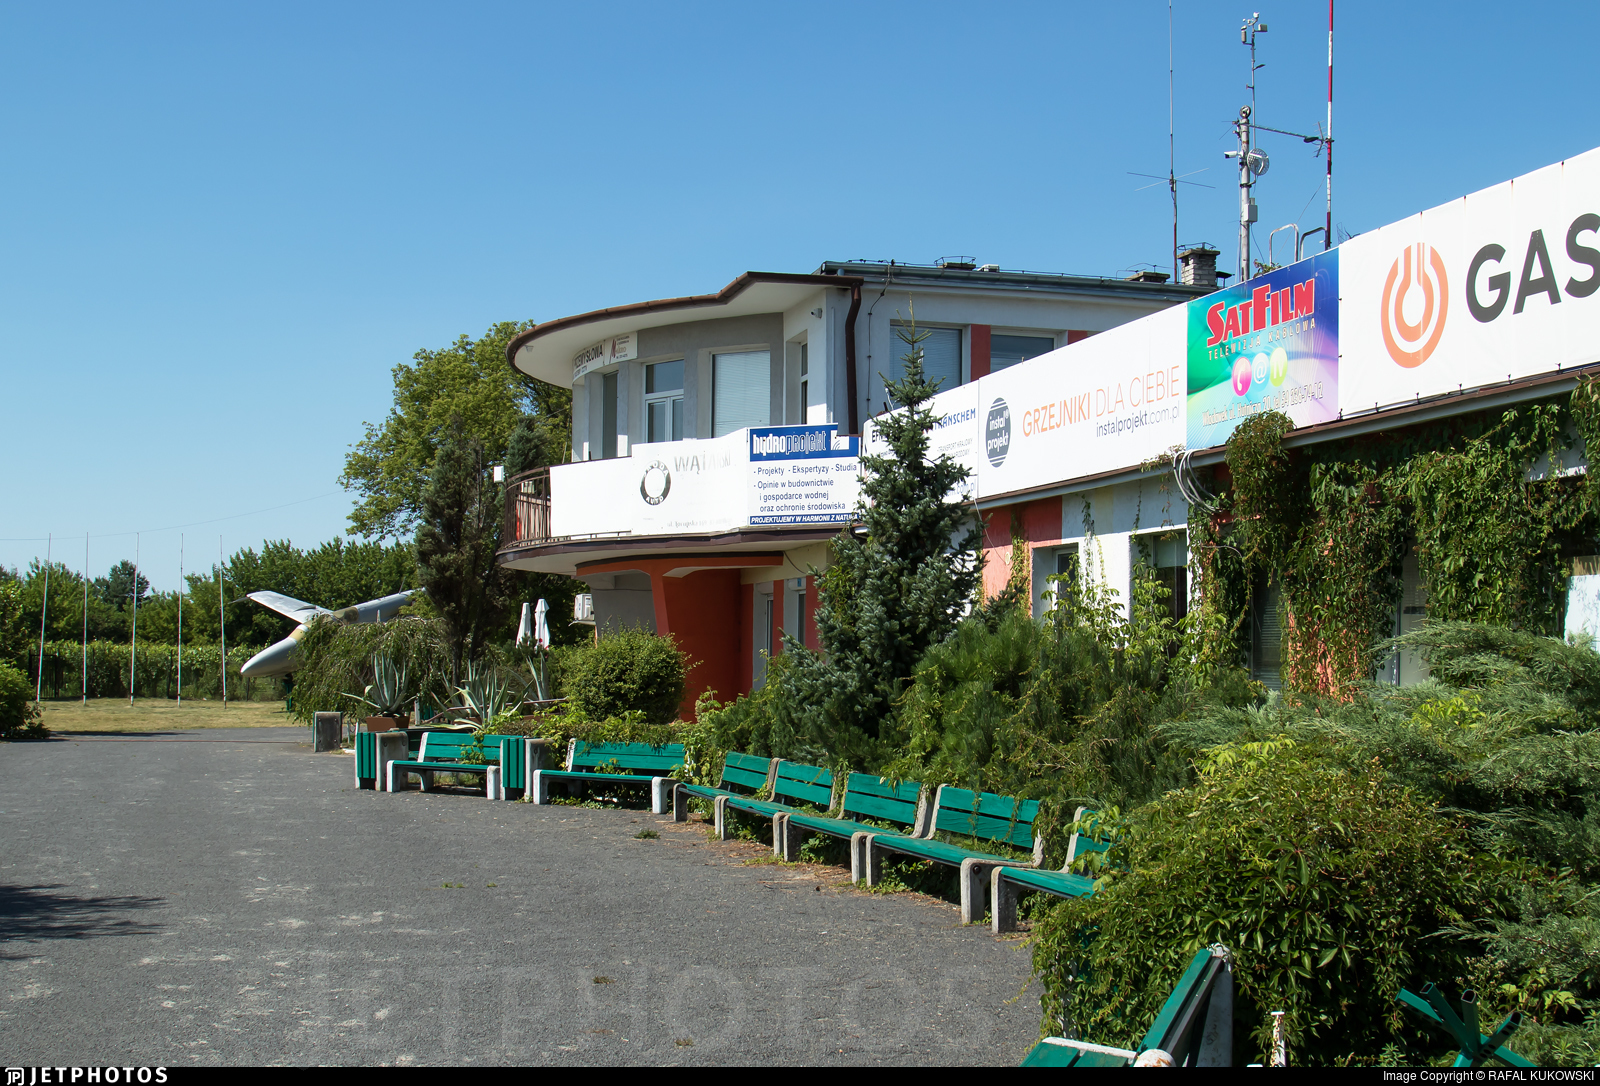 EPWK - Airport - Terminal